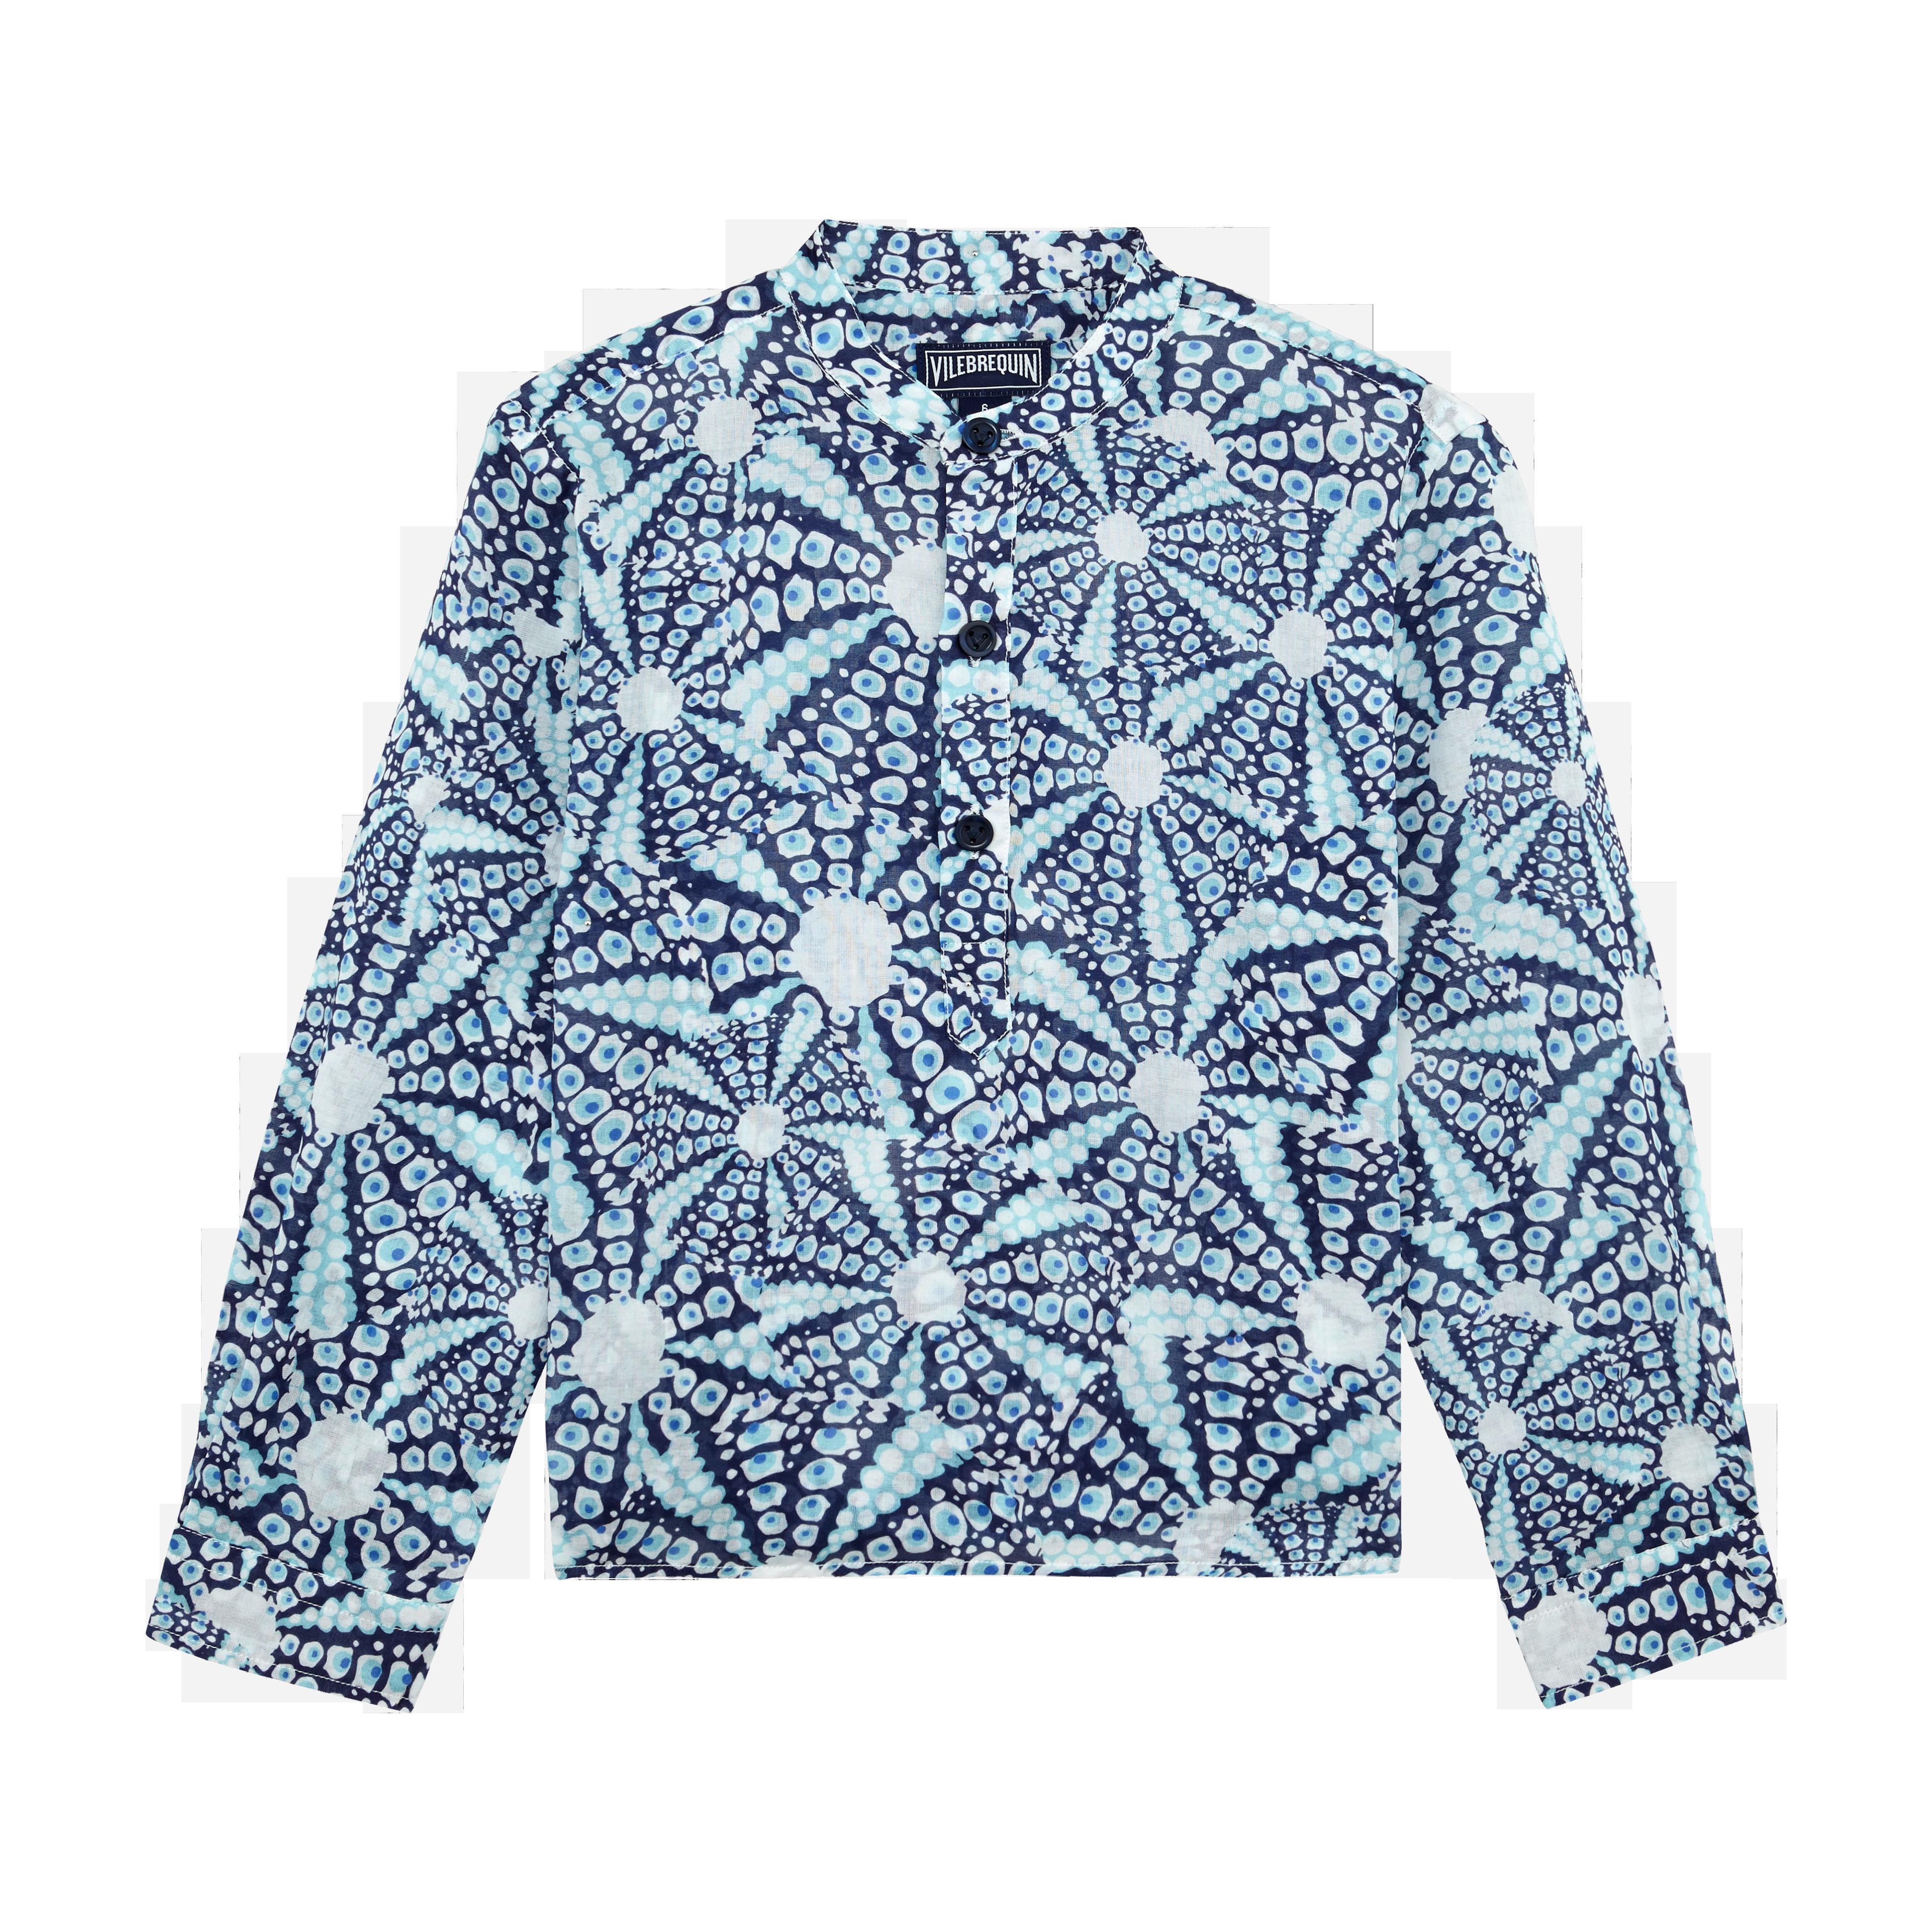 VILEBREQUIN | Boys Ready to Wear - Boys Cotton Voile Shirt Oursinade - SHIRT - JOMAO - Blue - 14 - Vilebrequin | Goxip